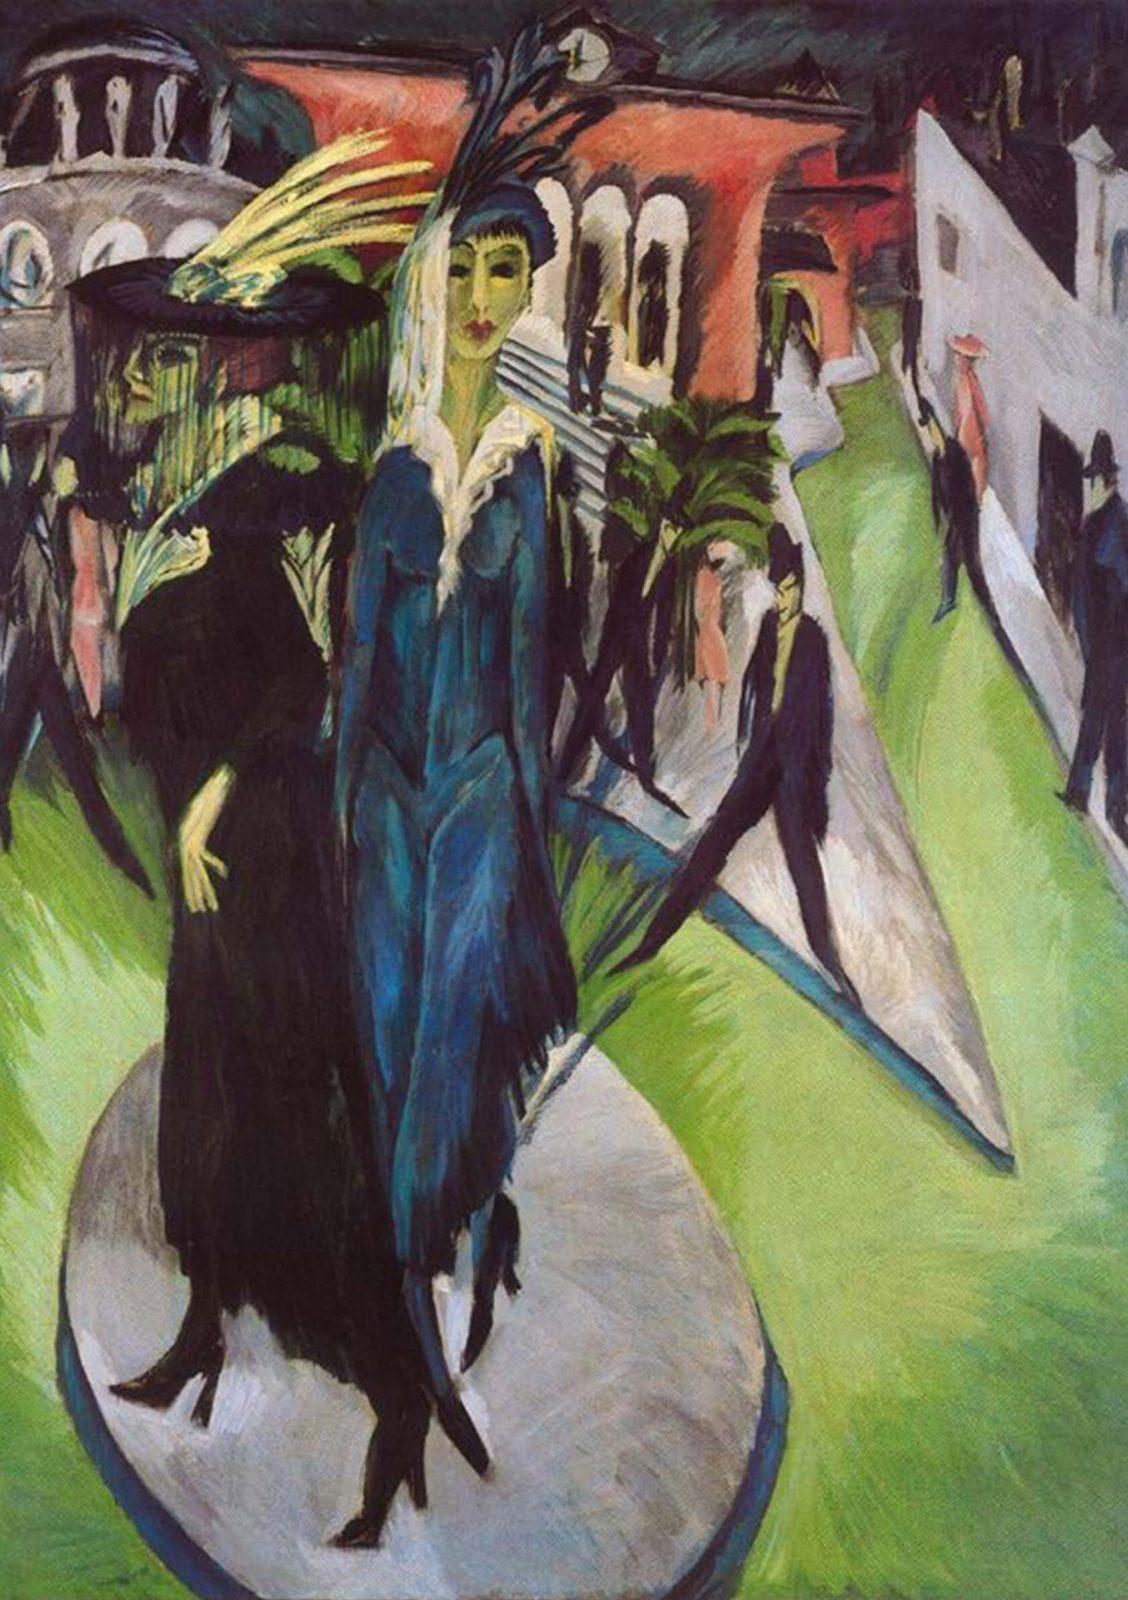 potsdamer-platz-art-masterpieces-to-see-in-berlin